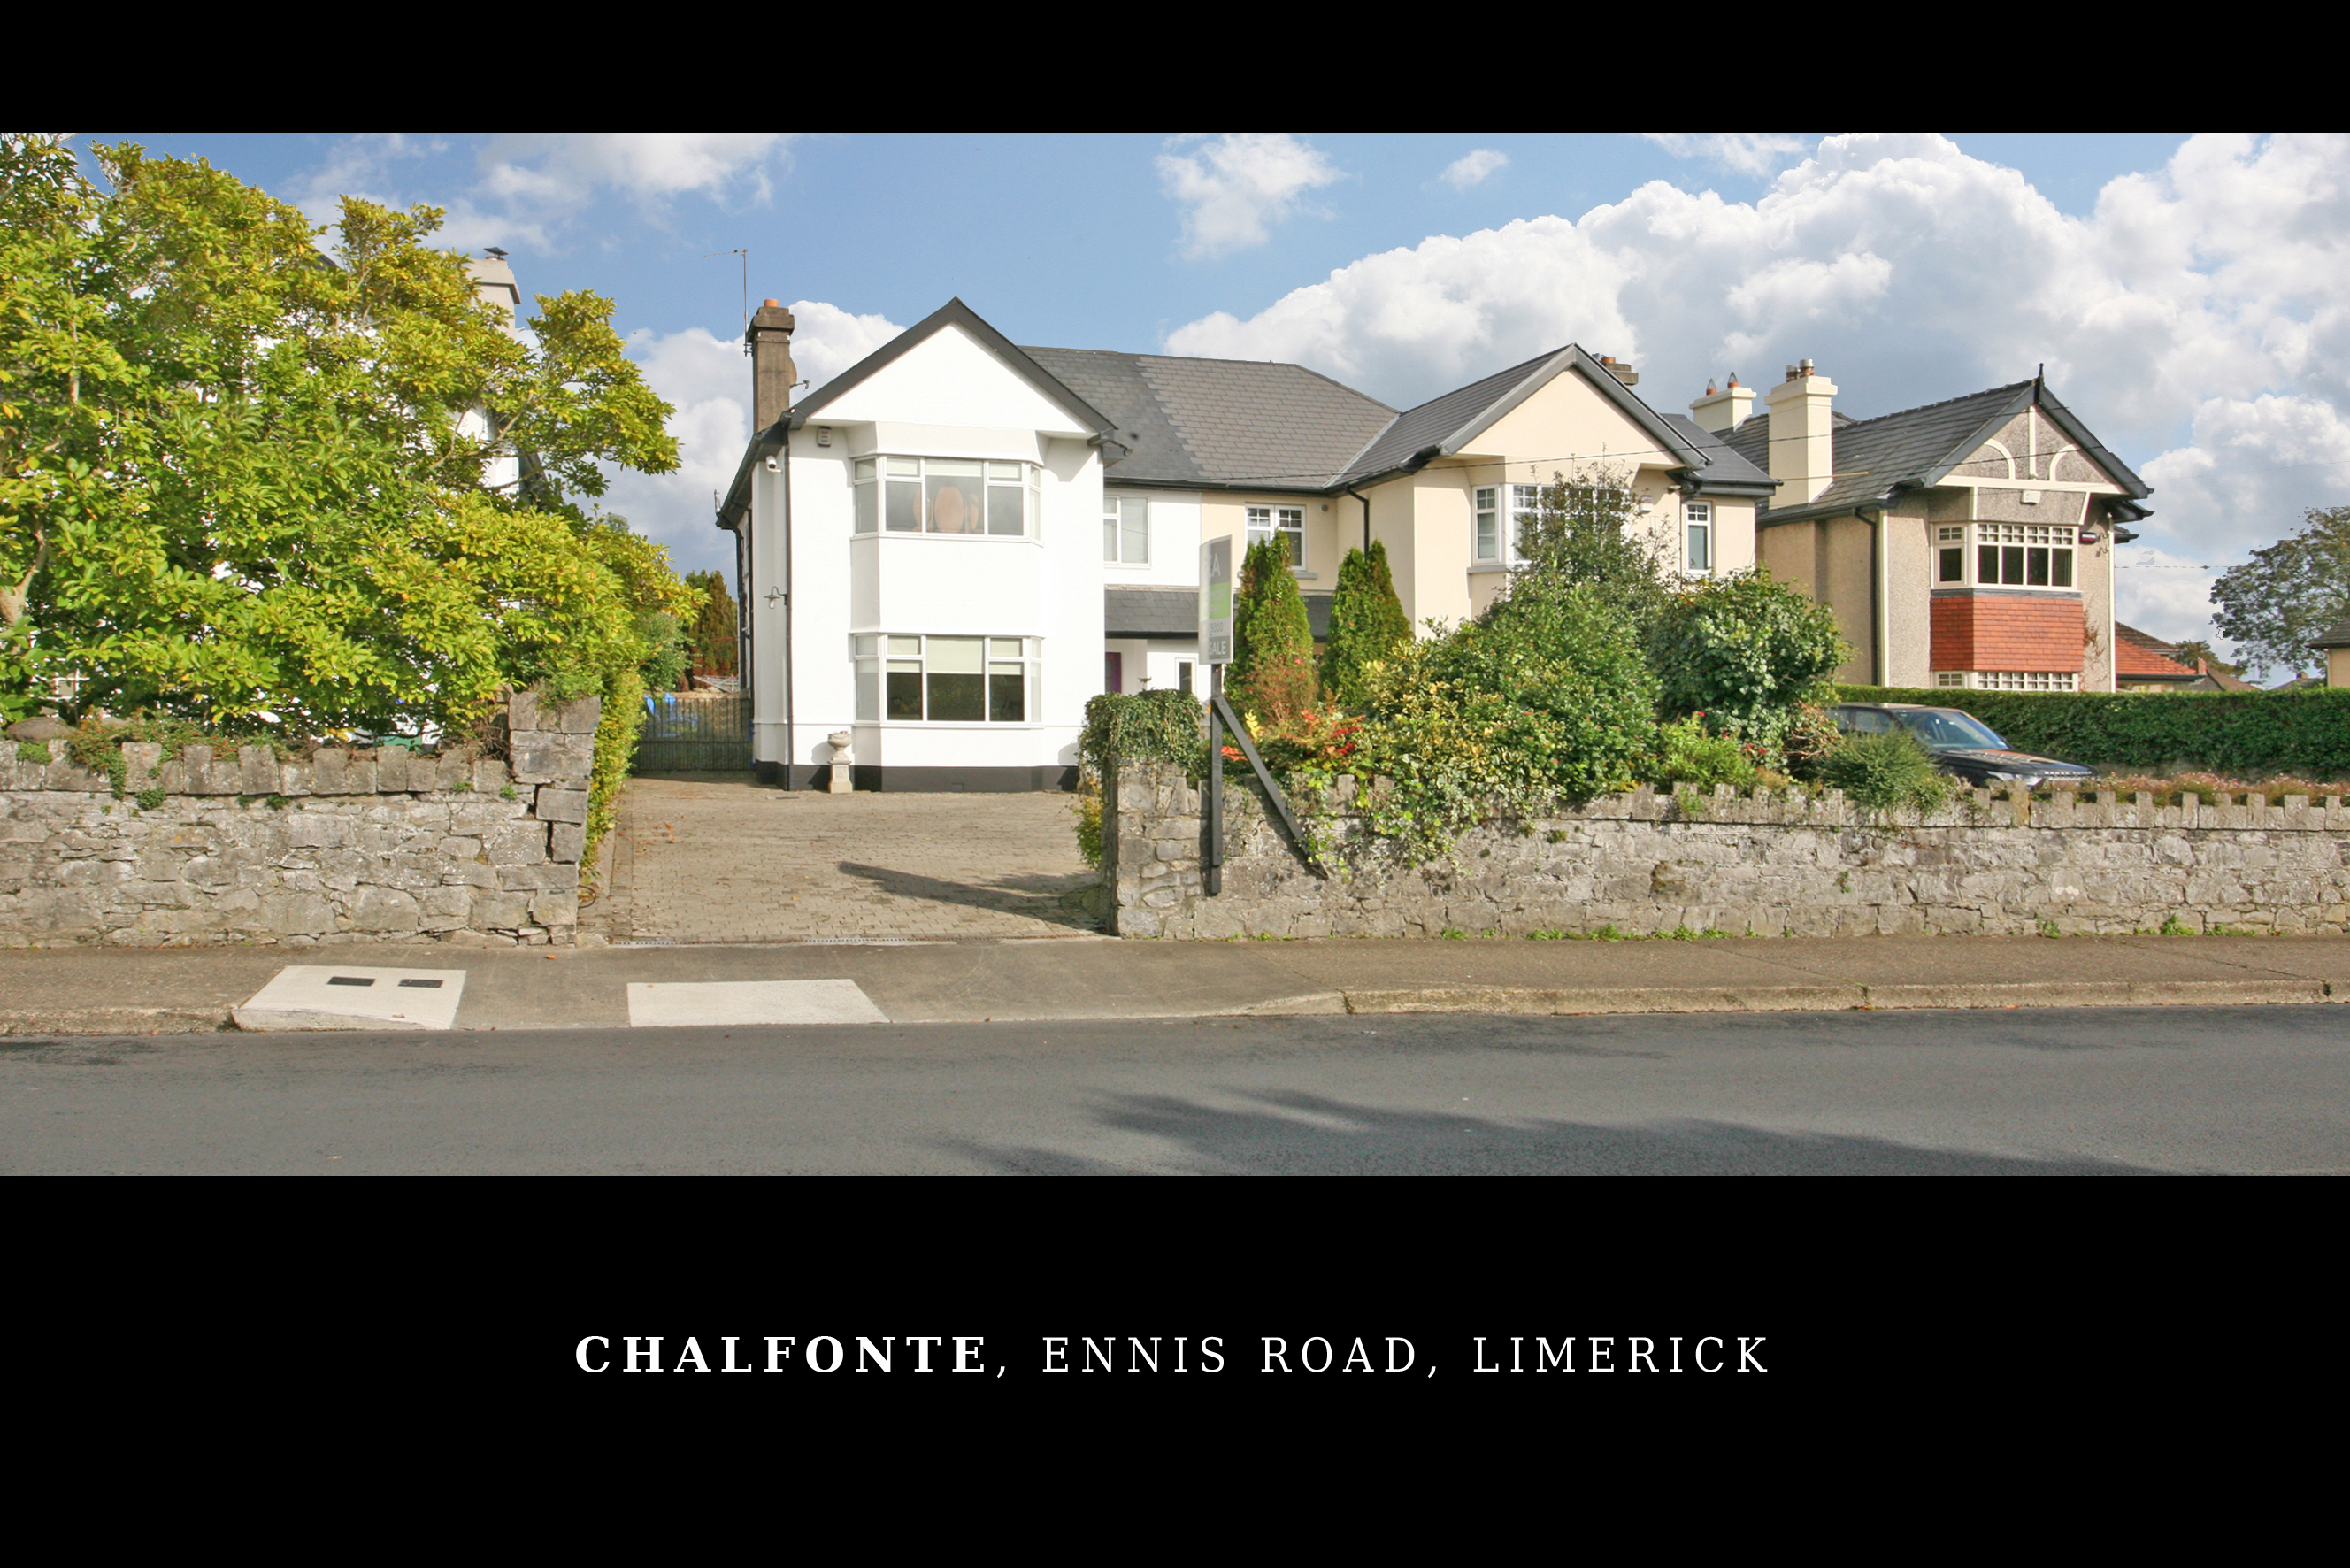 Chalfonte, Ennis Road, Limerick City